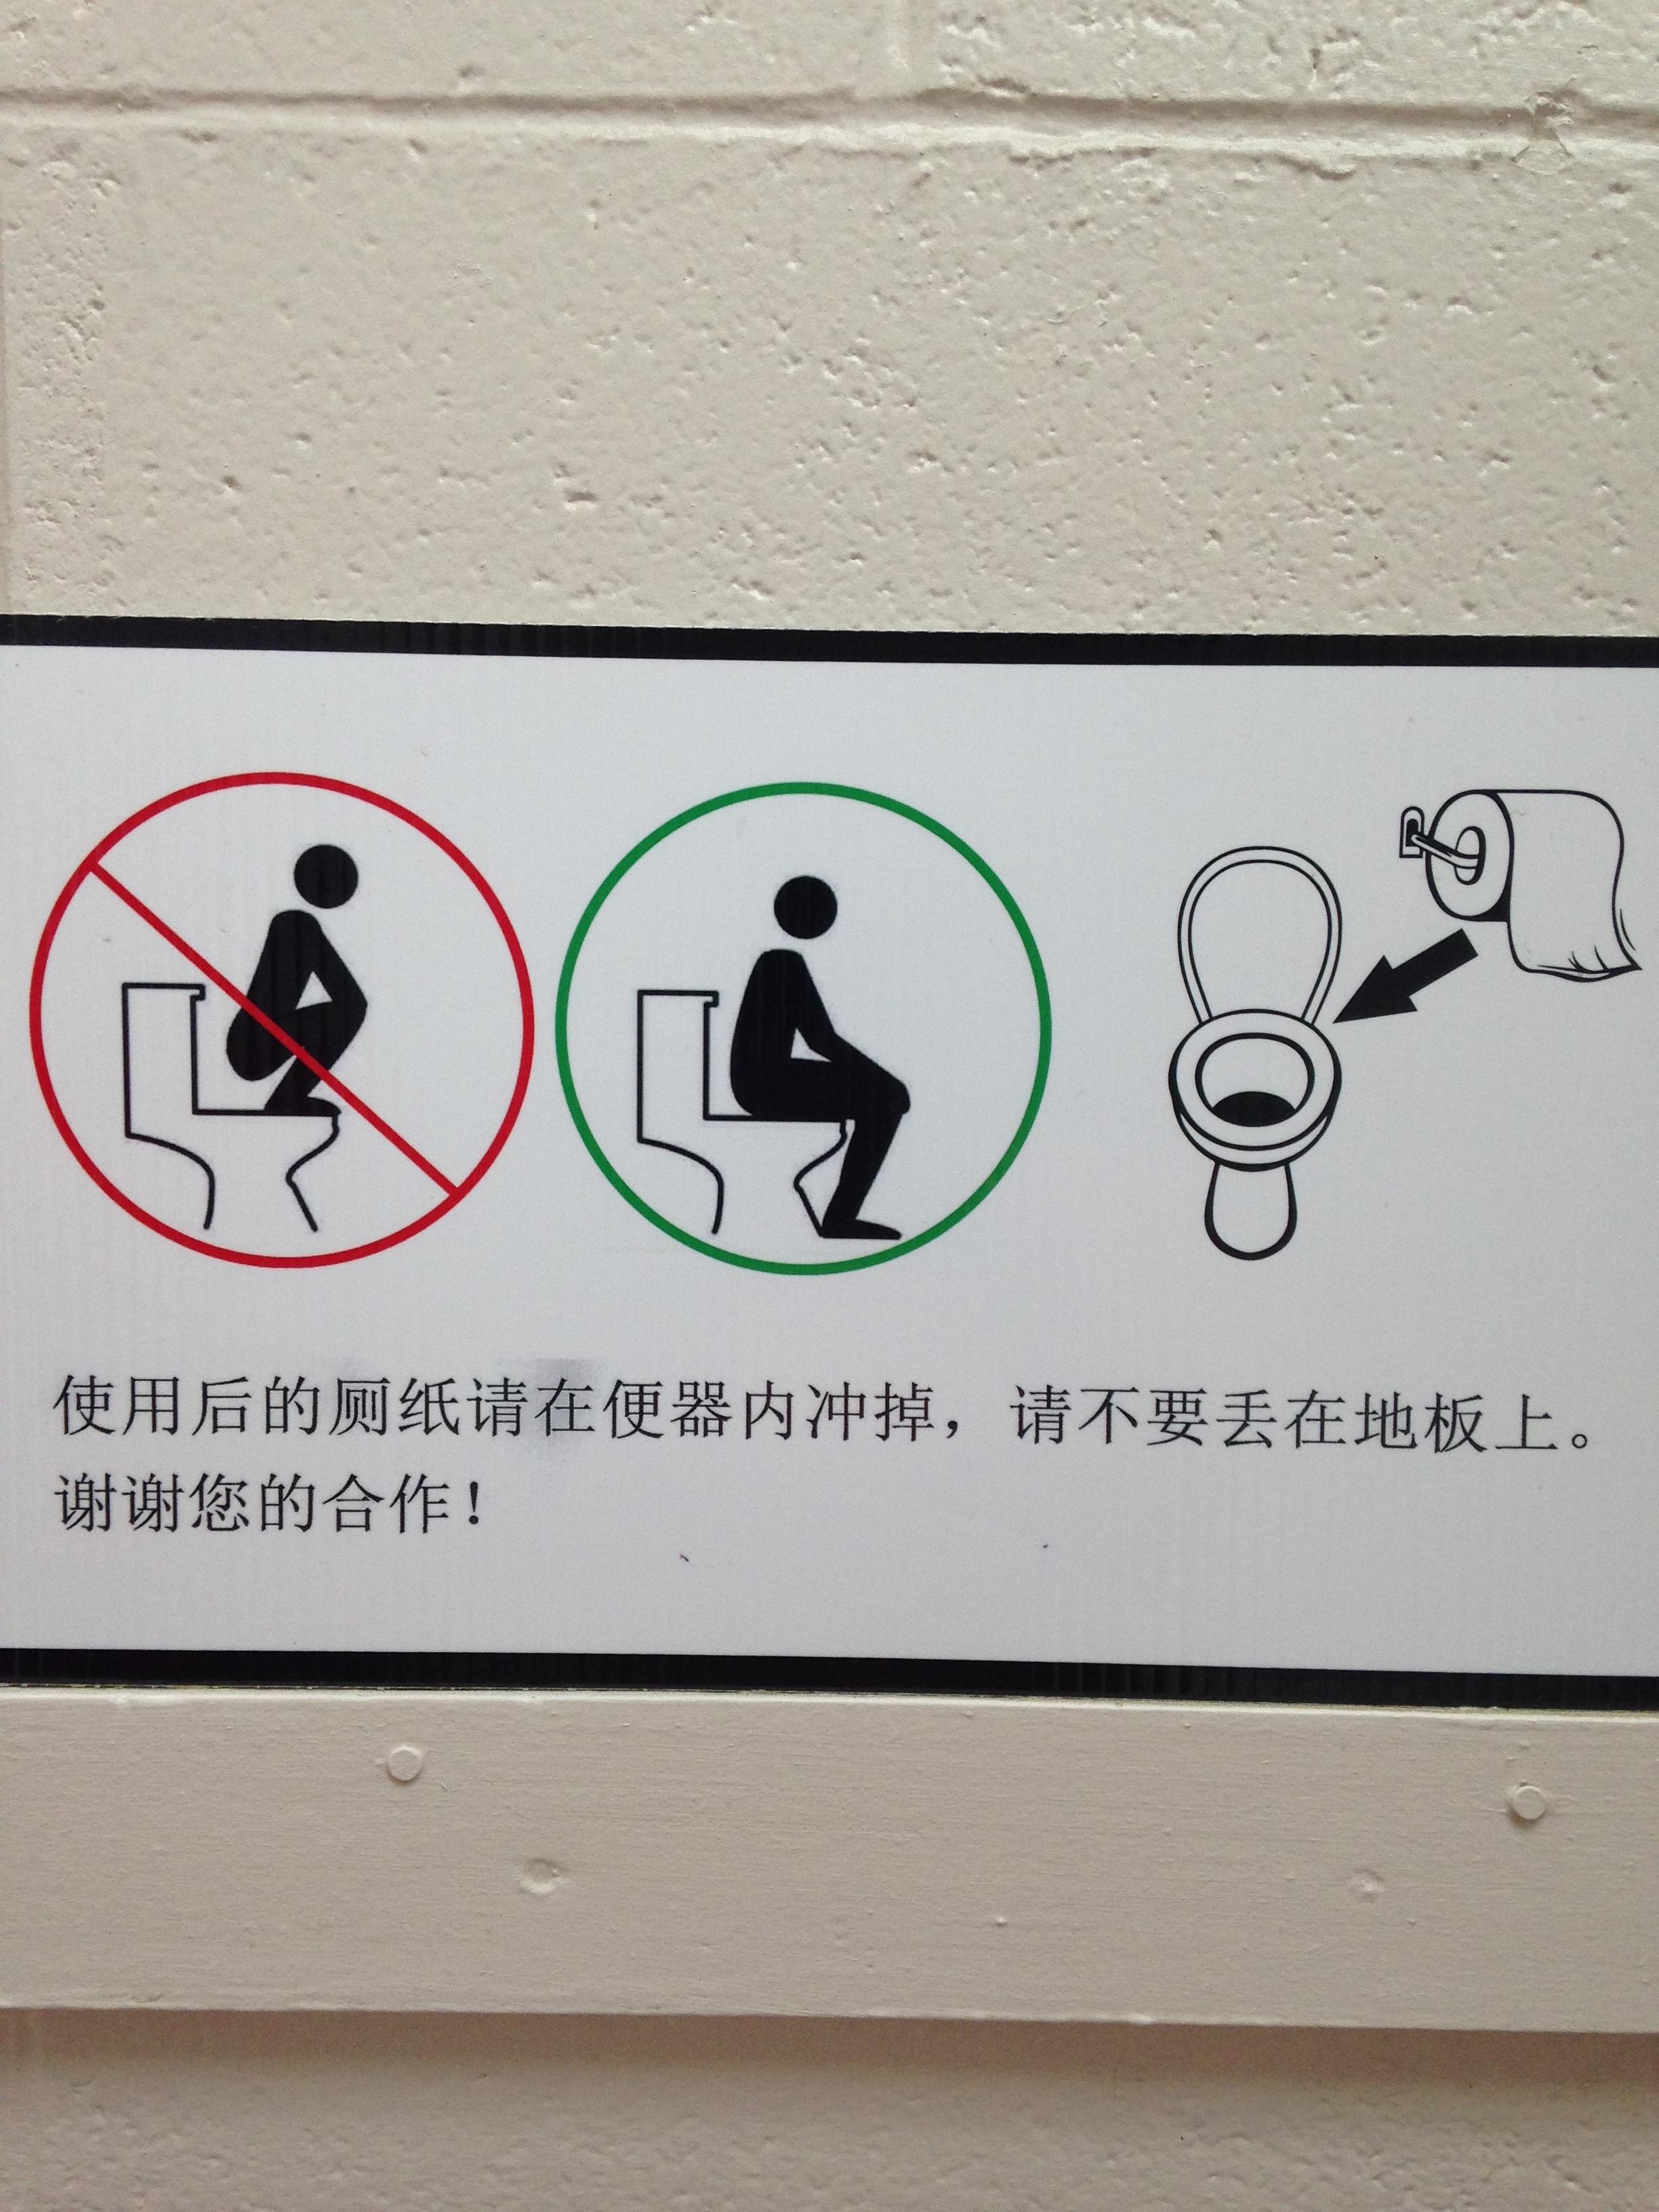 no squatting.jpg